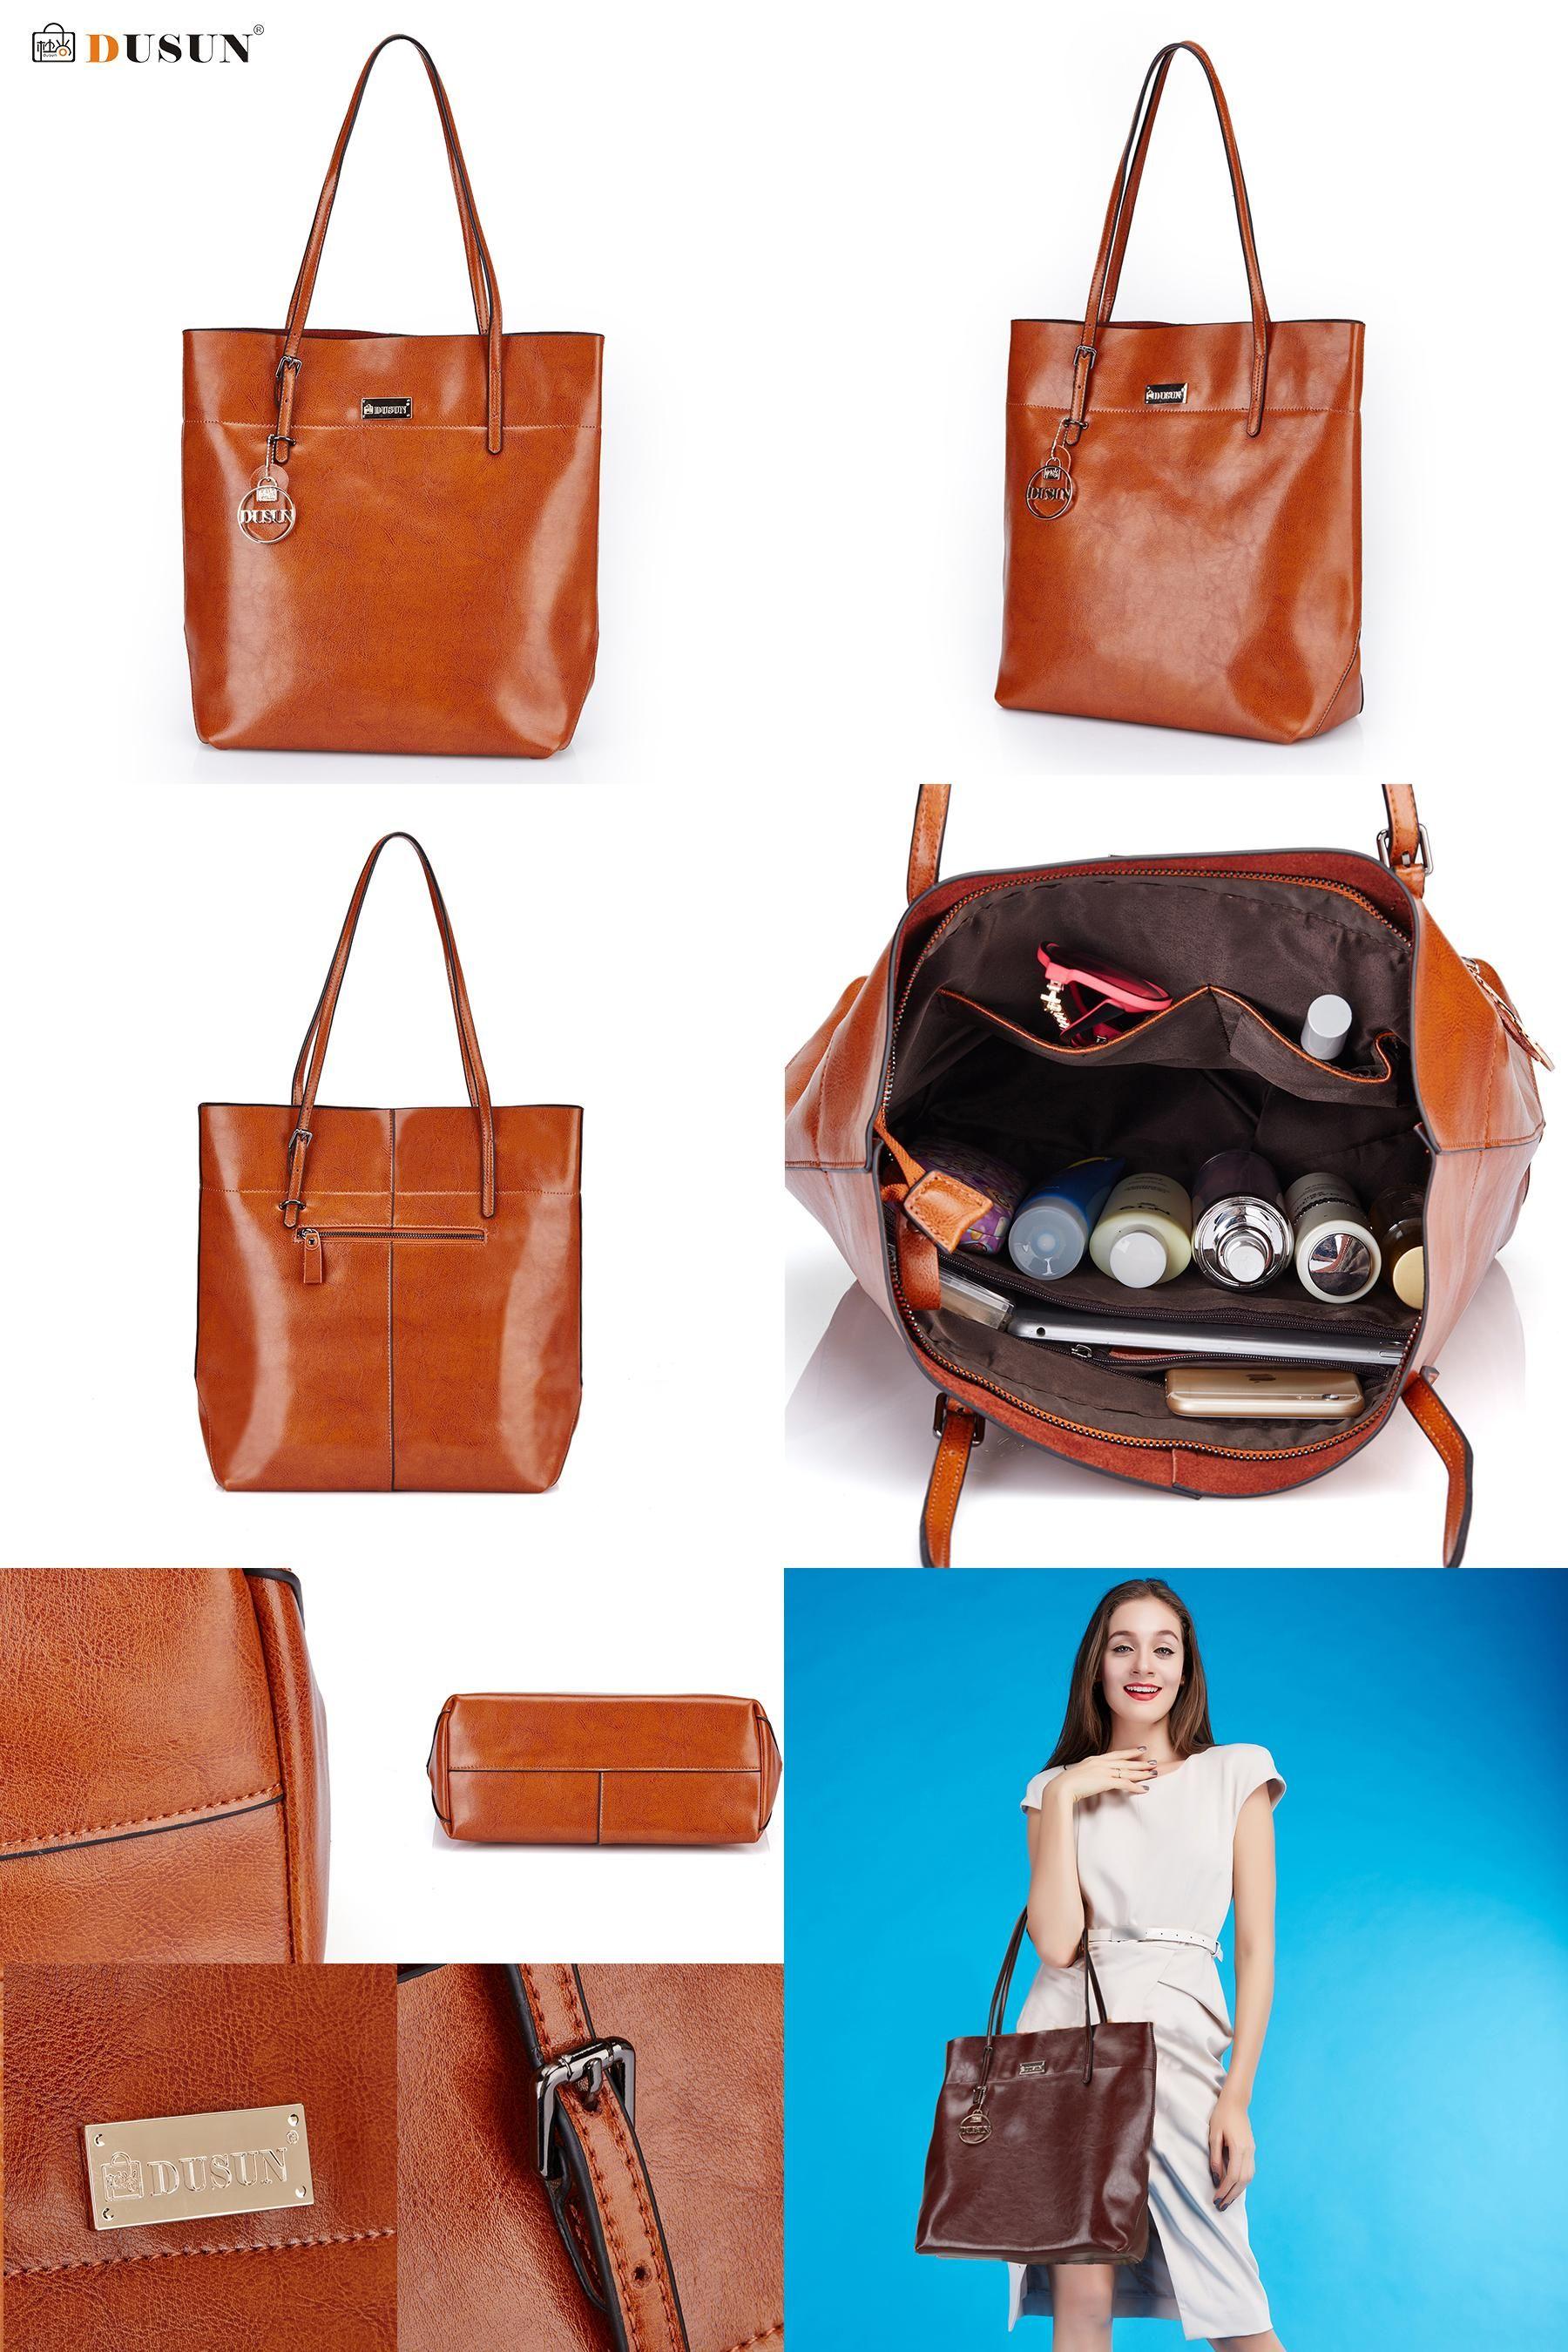 6e727f17d9  Visit to Buy  DUSUN Women Bag Genuine Leather Handbag Casual Women s Tote  Fashion Famous